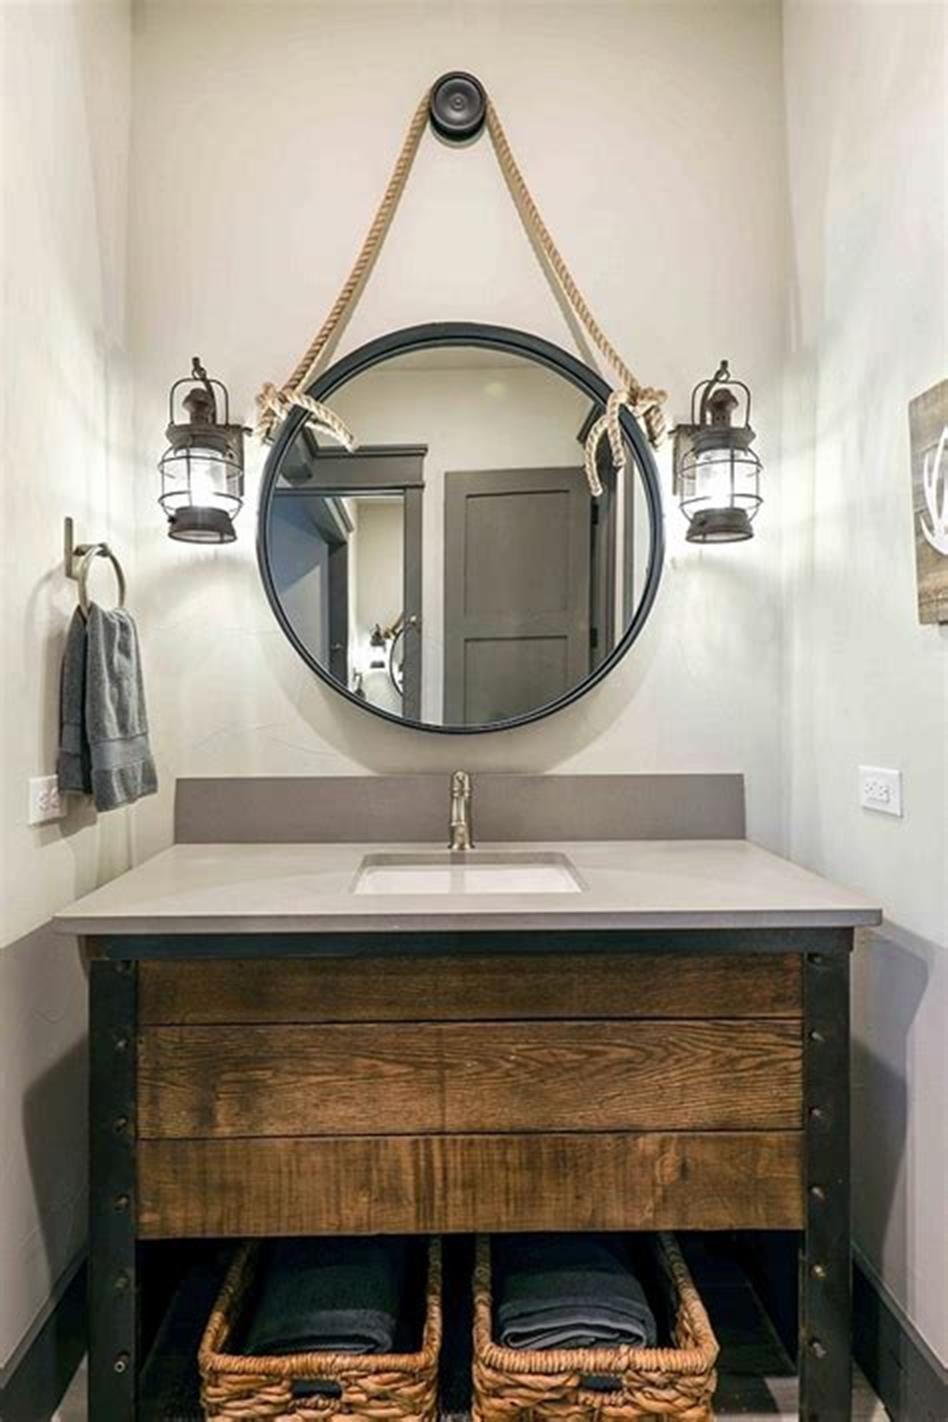 40+ Best Farmhouse and Rustic Bathroom Vanities Ideas 2019